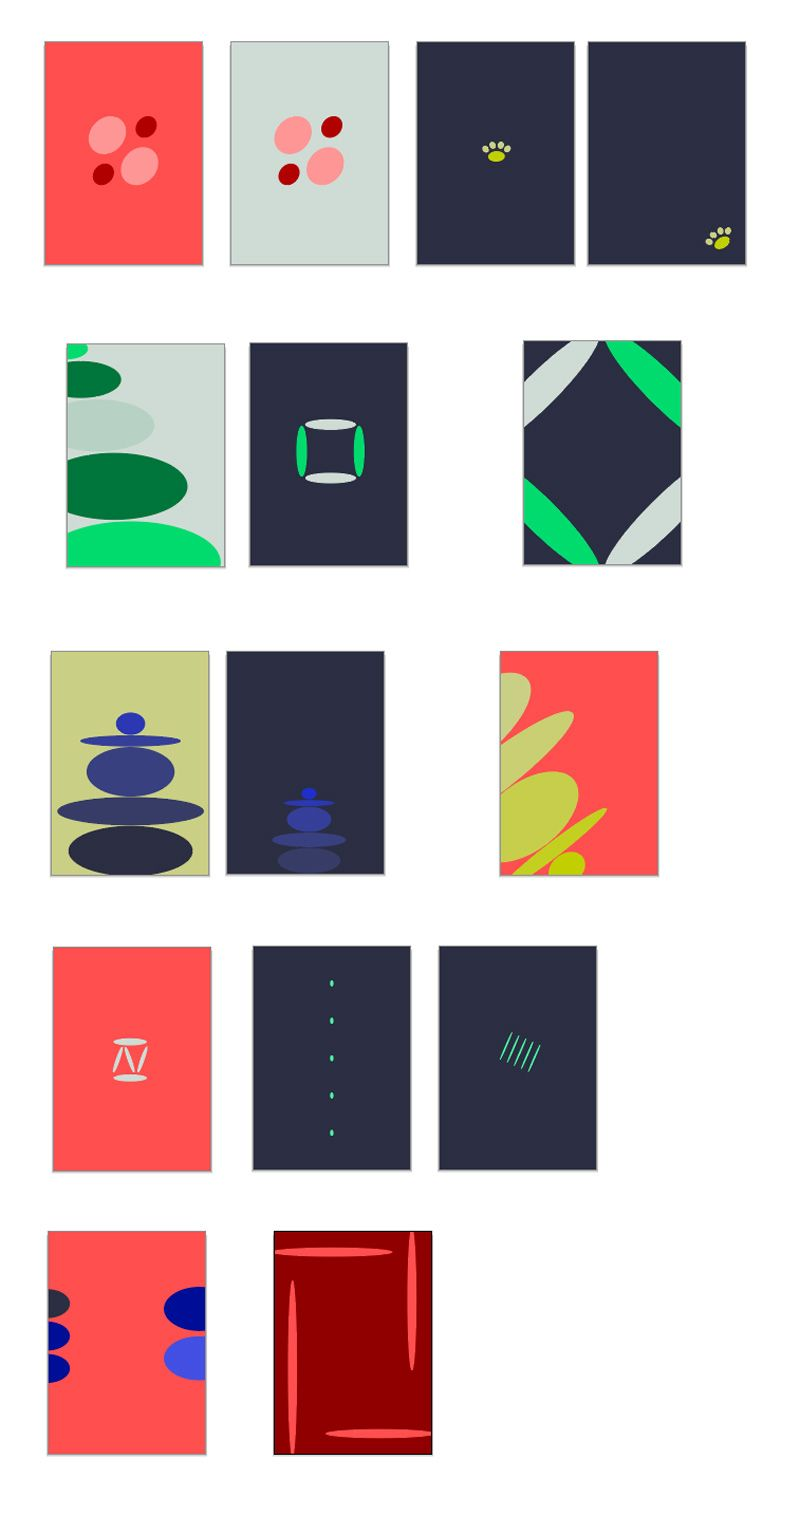 Explorative Design - image 5 - student project